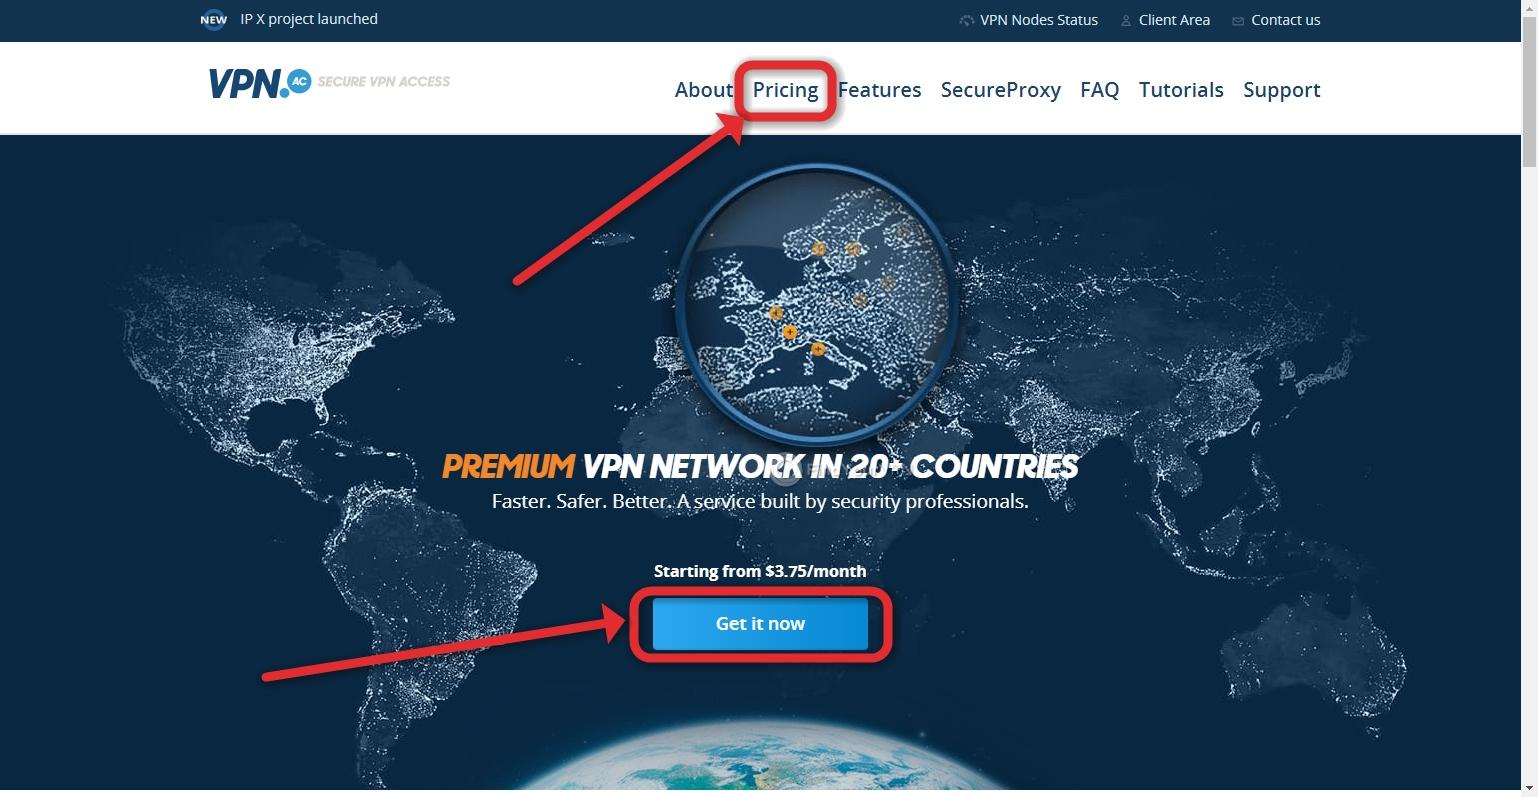 VPN.AC Creating Account